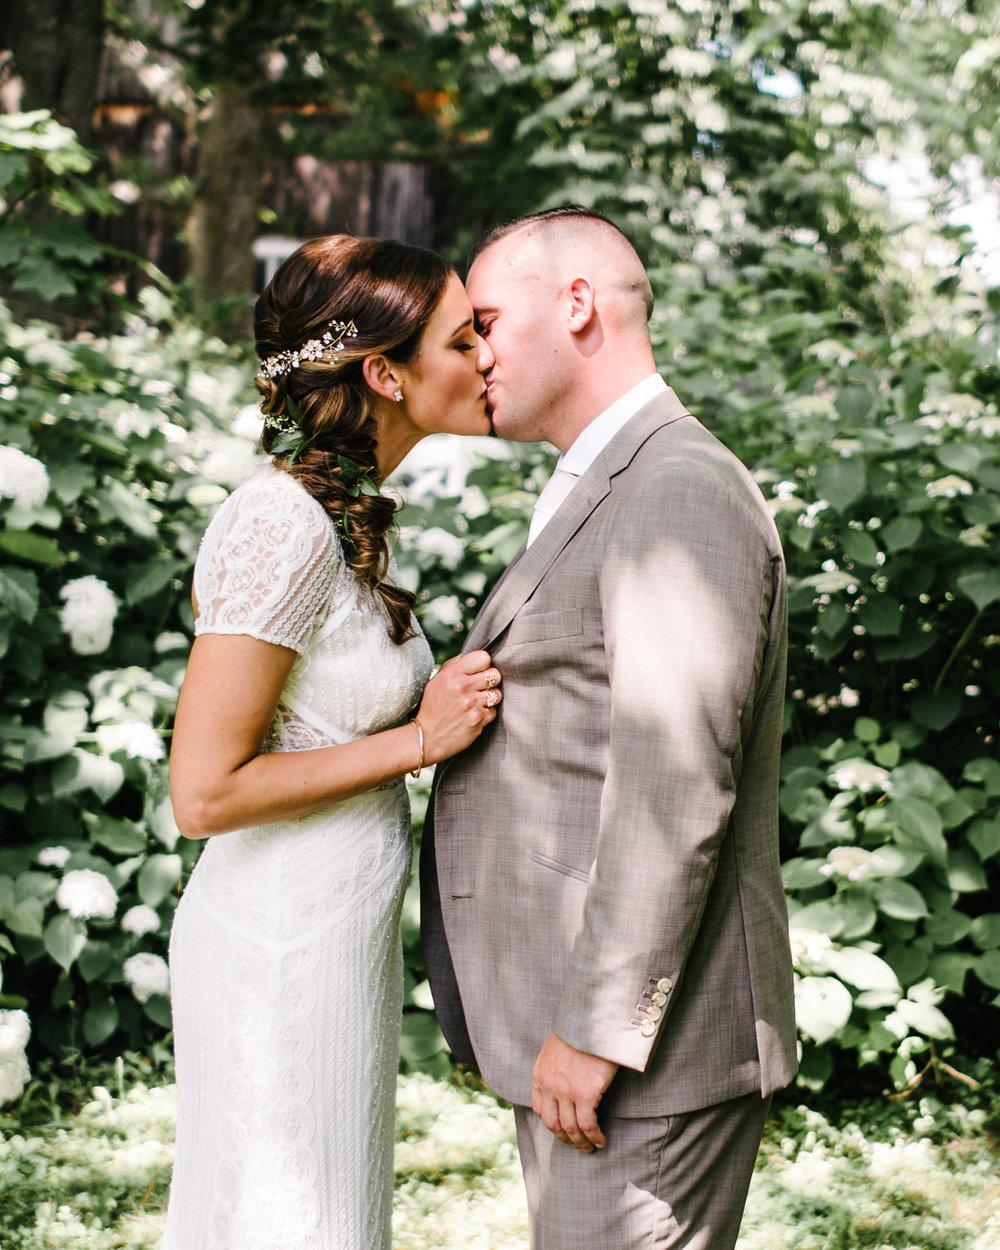 tinakyle_coupleportraits-5816.jpg